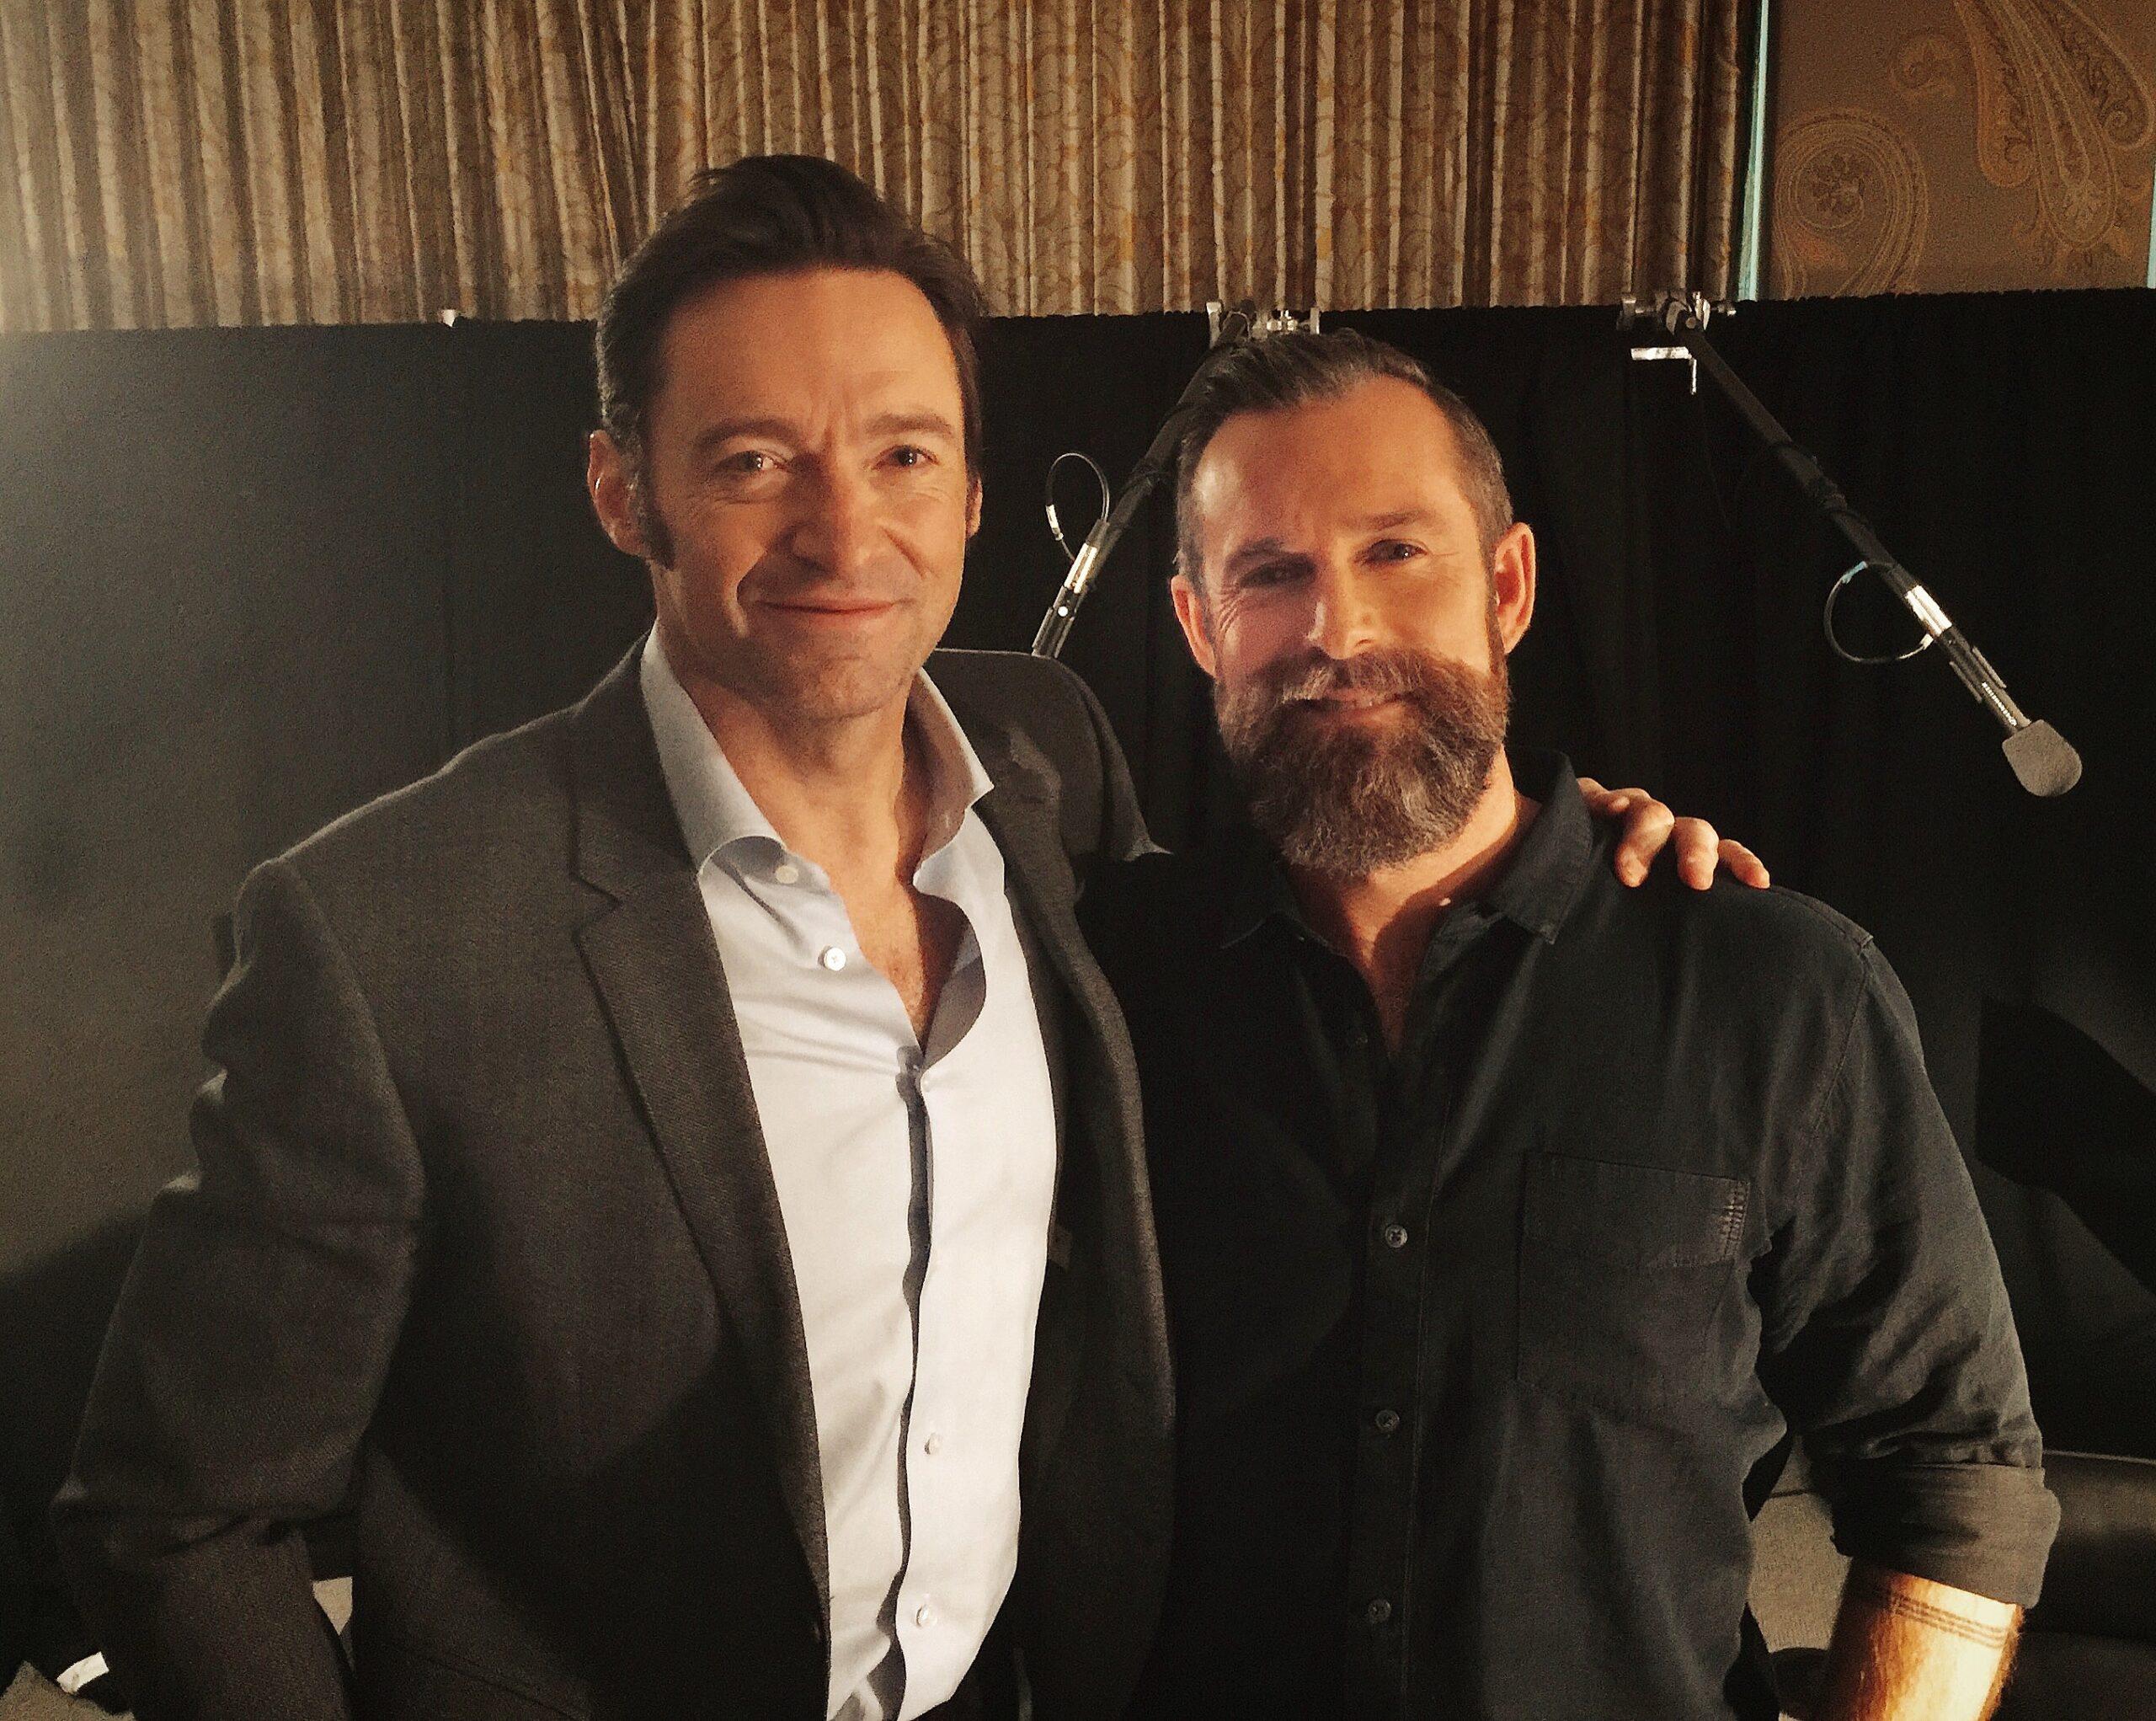 The Real Hugh Jackman: From WAAPA to Logan